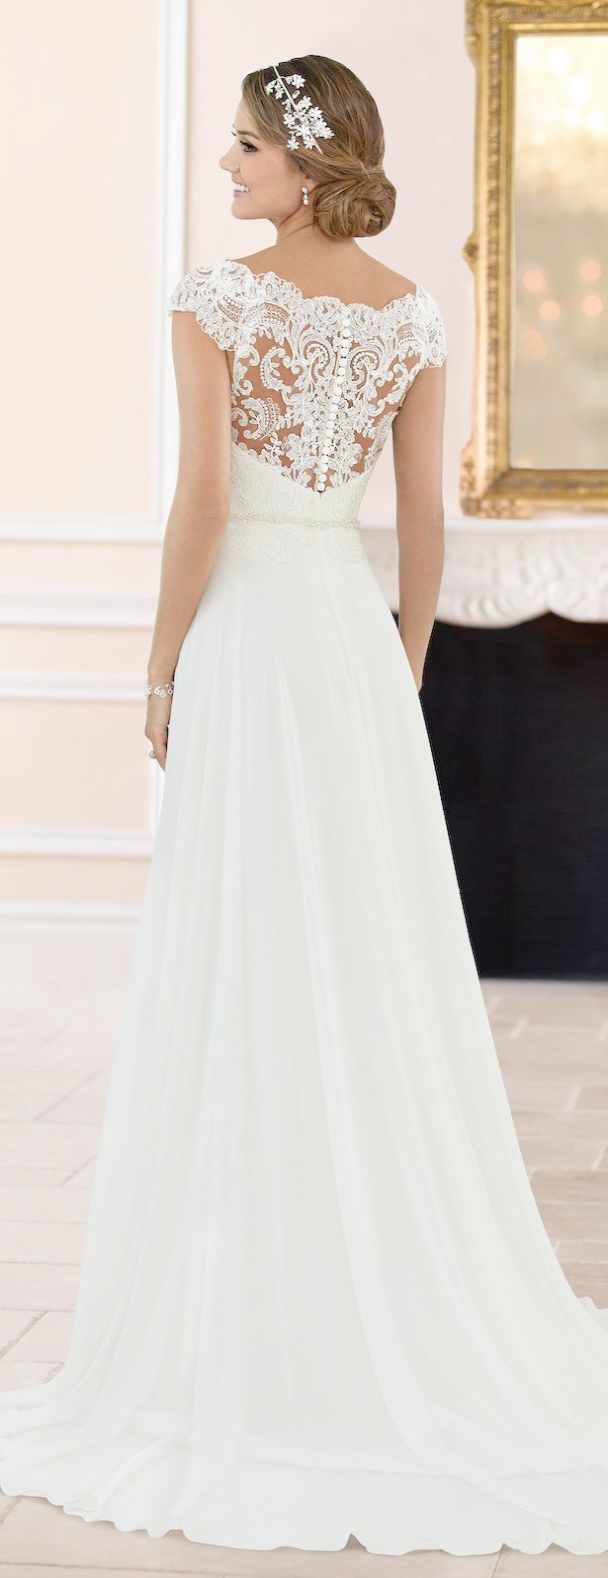 Lace wedding dress designers  Lace Wedding Dress Designers Lace Wedding Dresses Mid Length  Lace